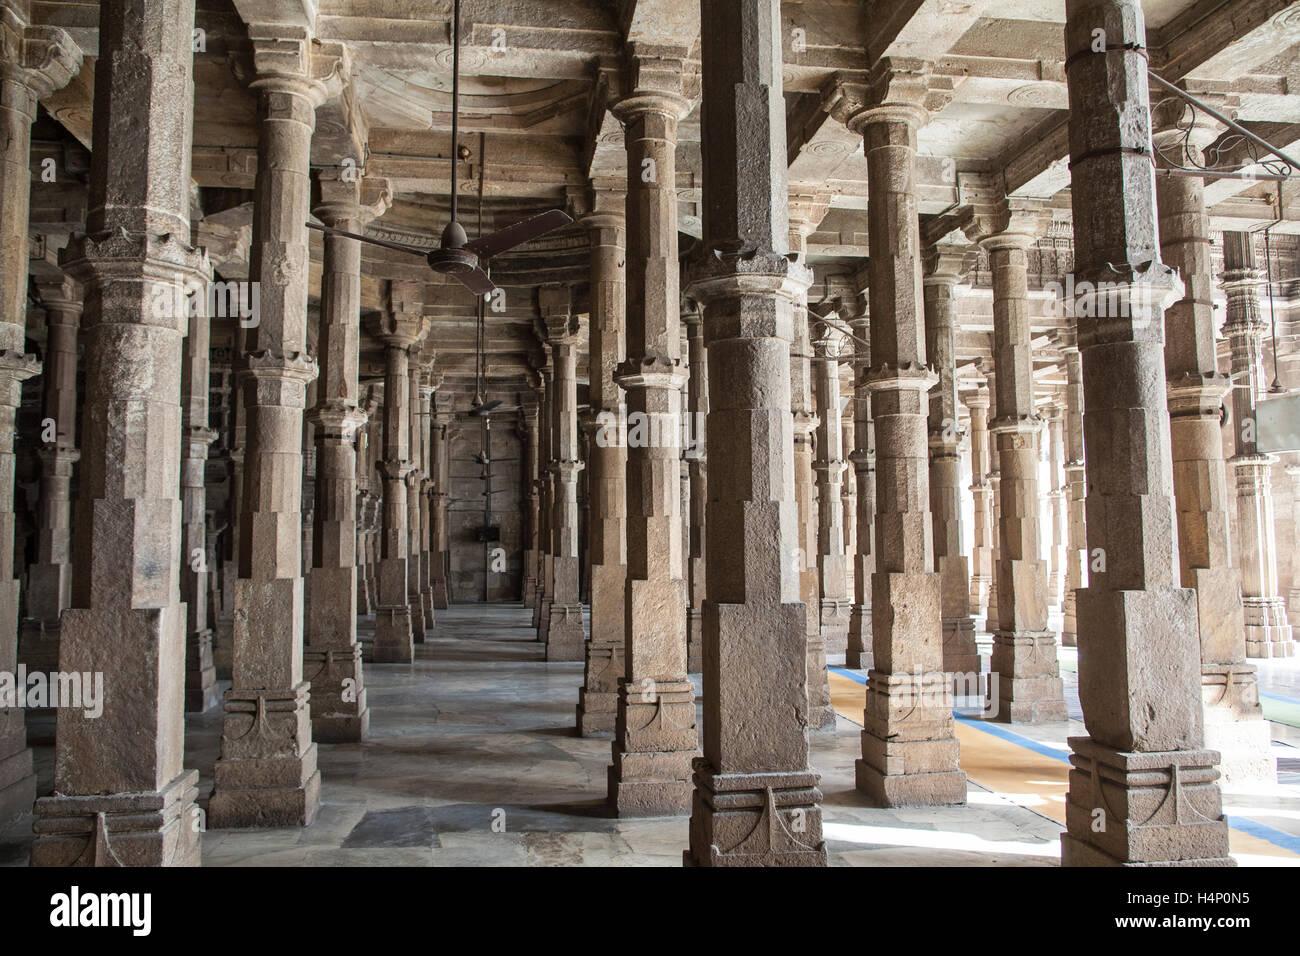 Jumma,Juma Masjid mosque,biggest and ancient building in Ahmedabad city,Gujurat,India,Asia. Stock Photo